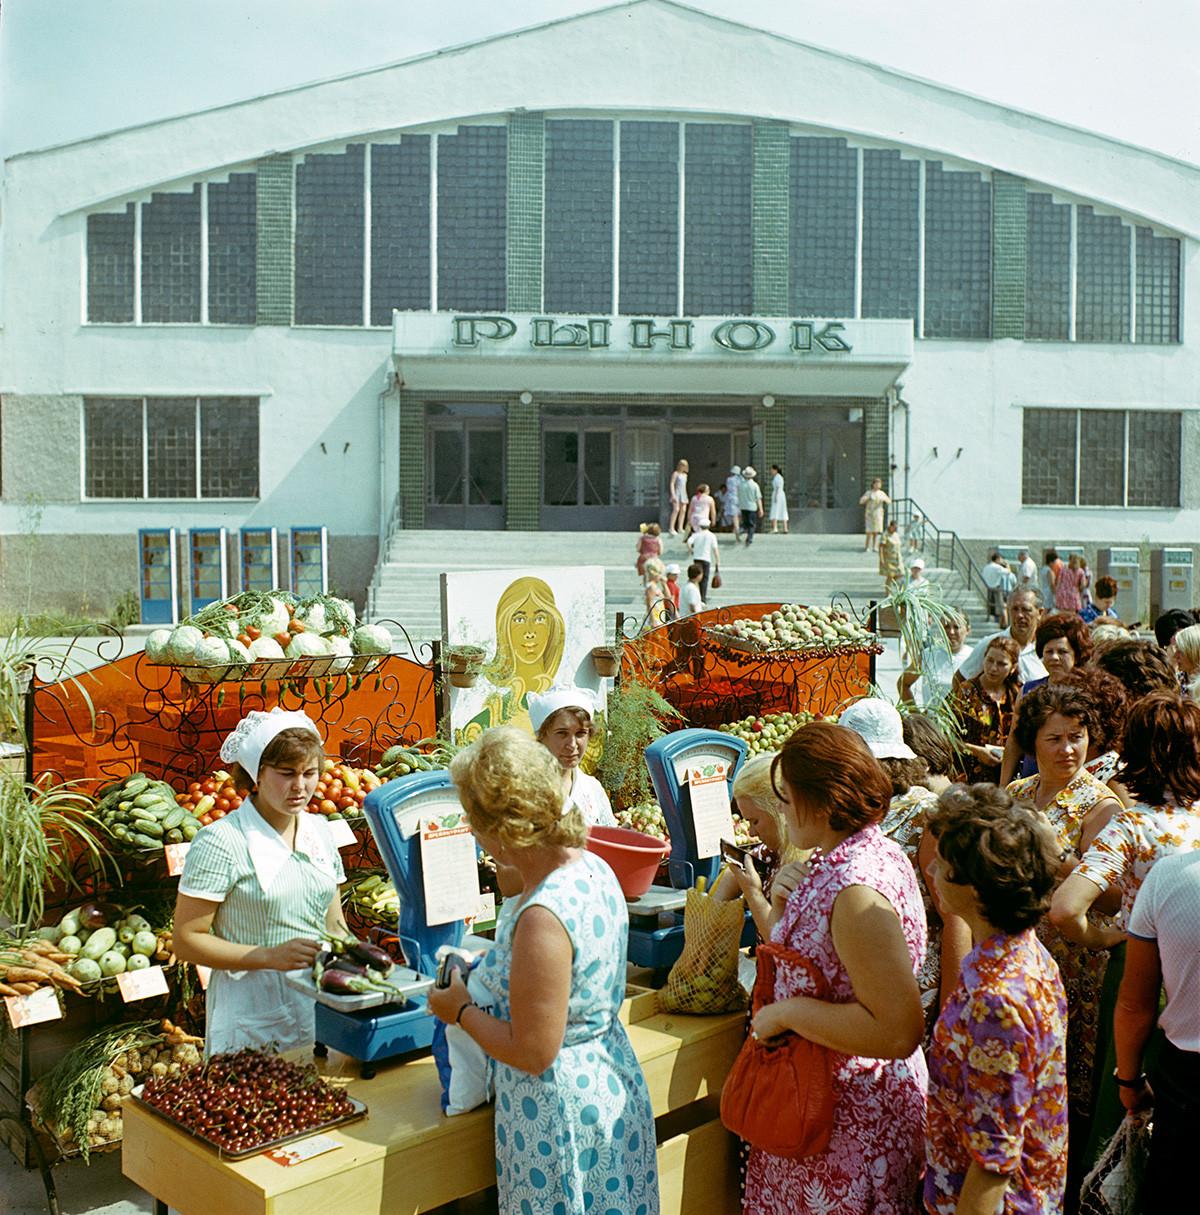 Commerce de fruits et légumes dans les rues d'Eupatoria, en Crimée, 1979